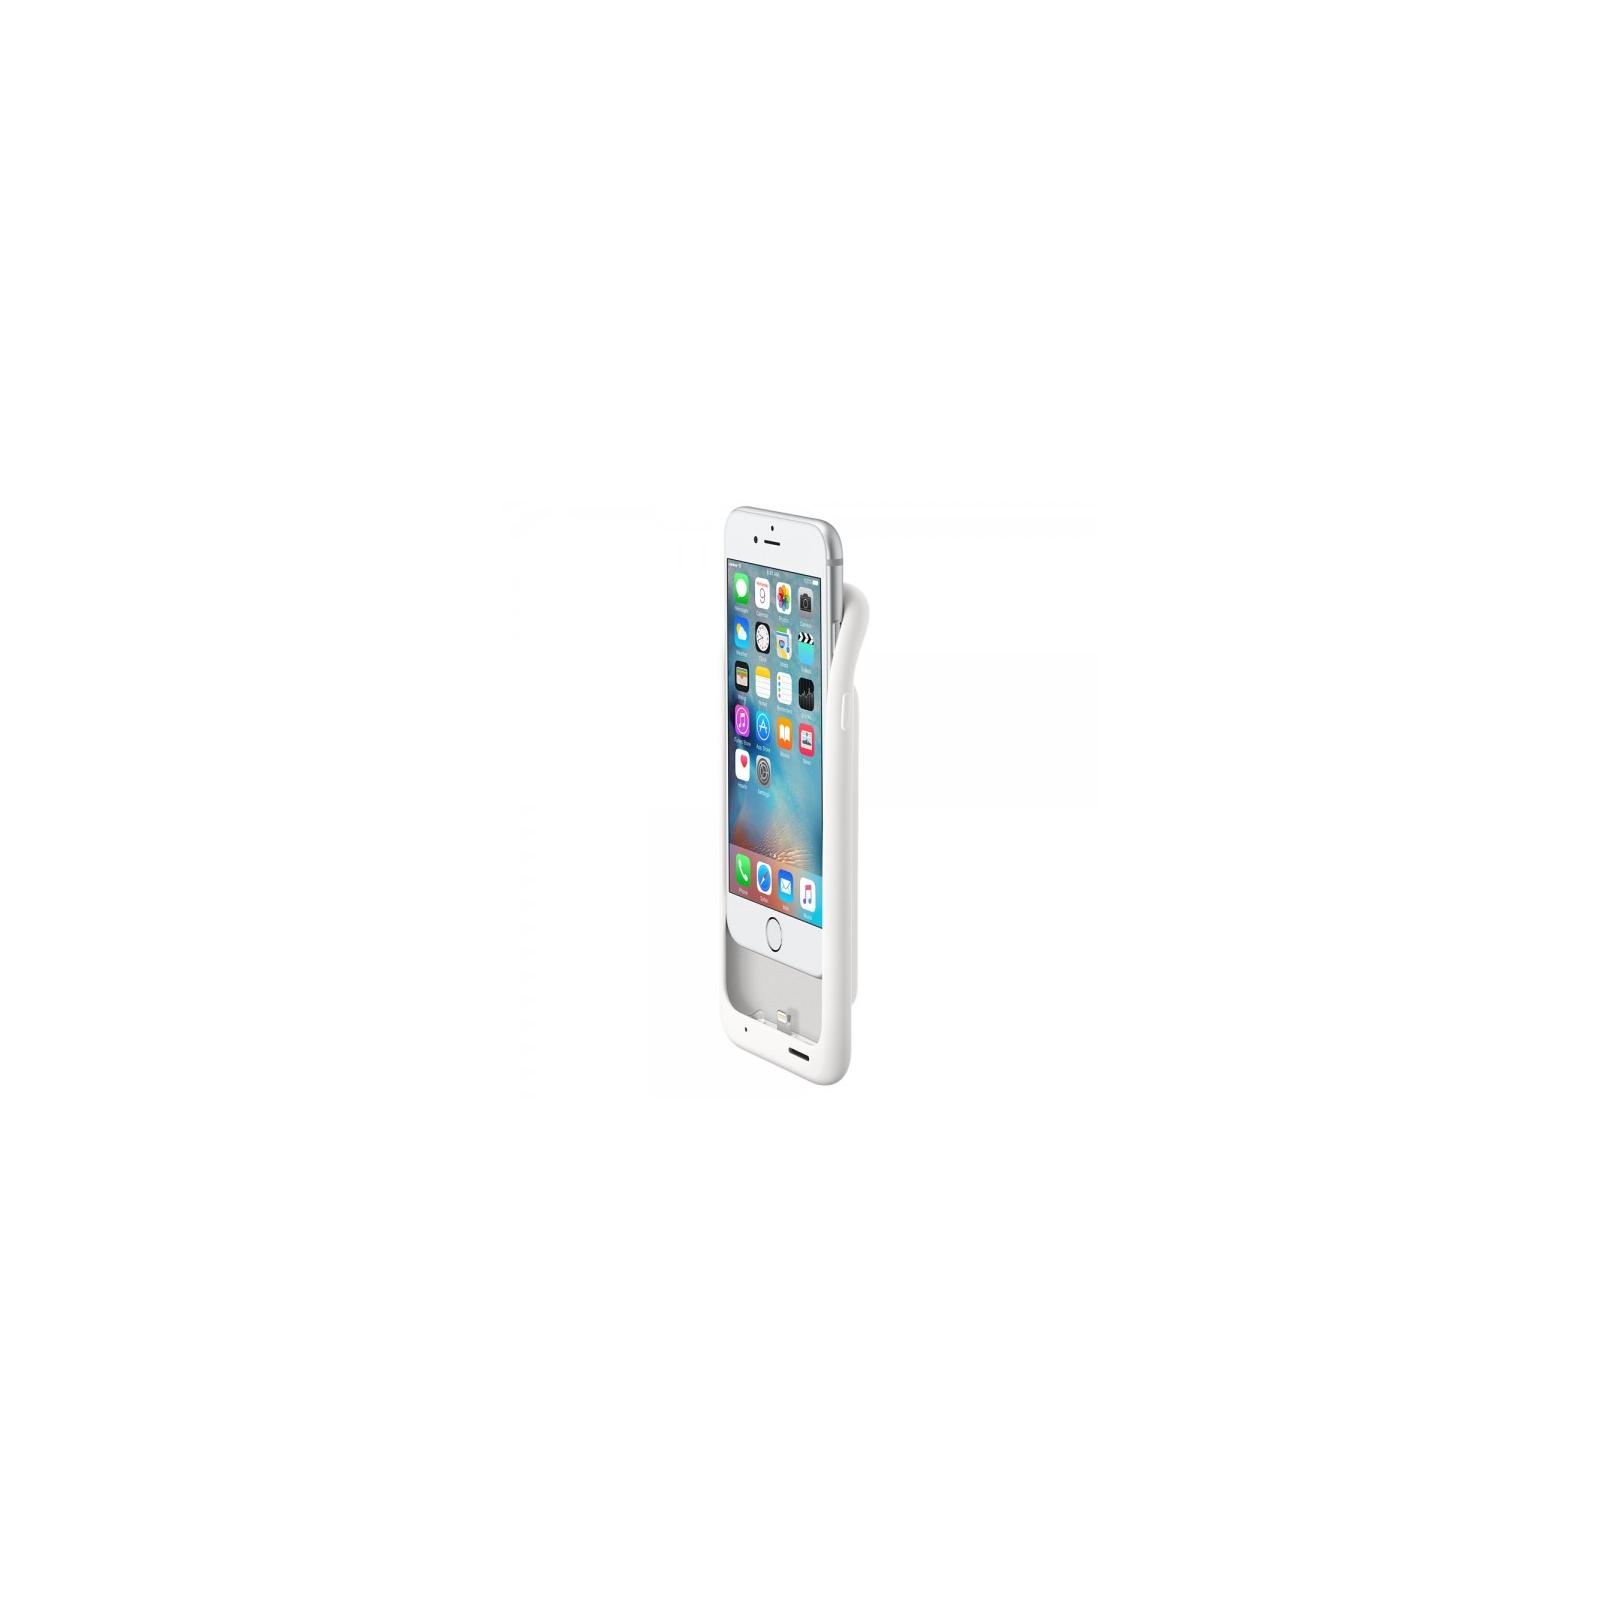 Чехол для моб. телефона Apple Smart Battery Case для iPhone 6/6s White (MGQM2ZM/A) изображение 5